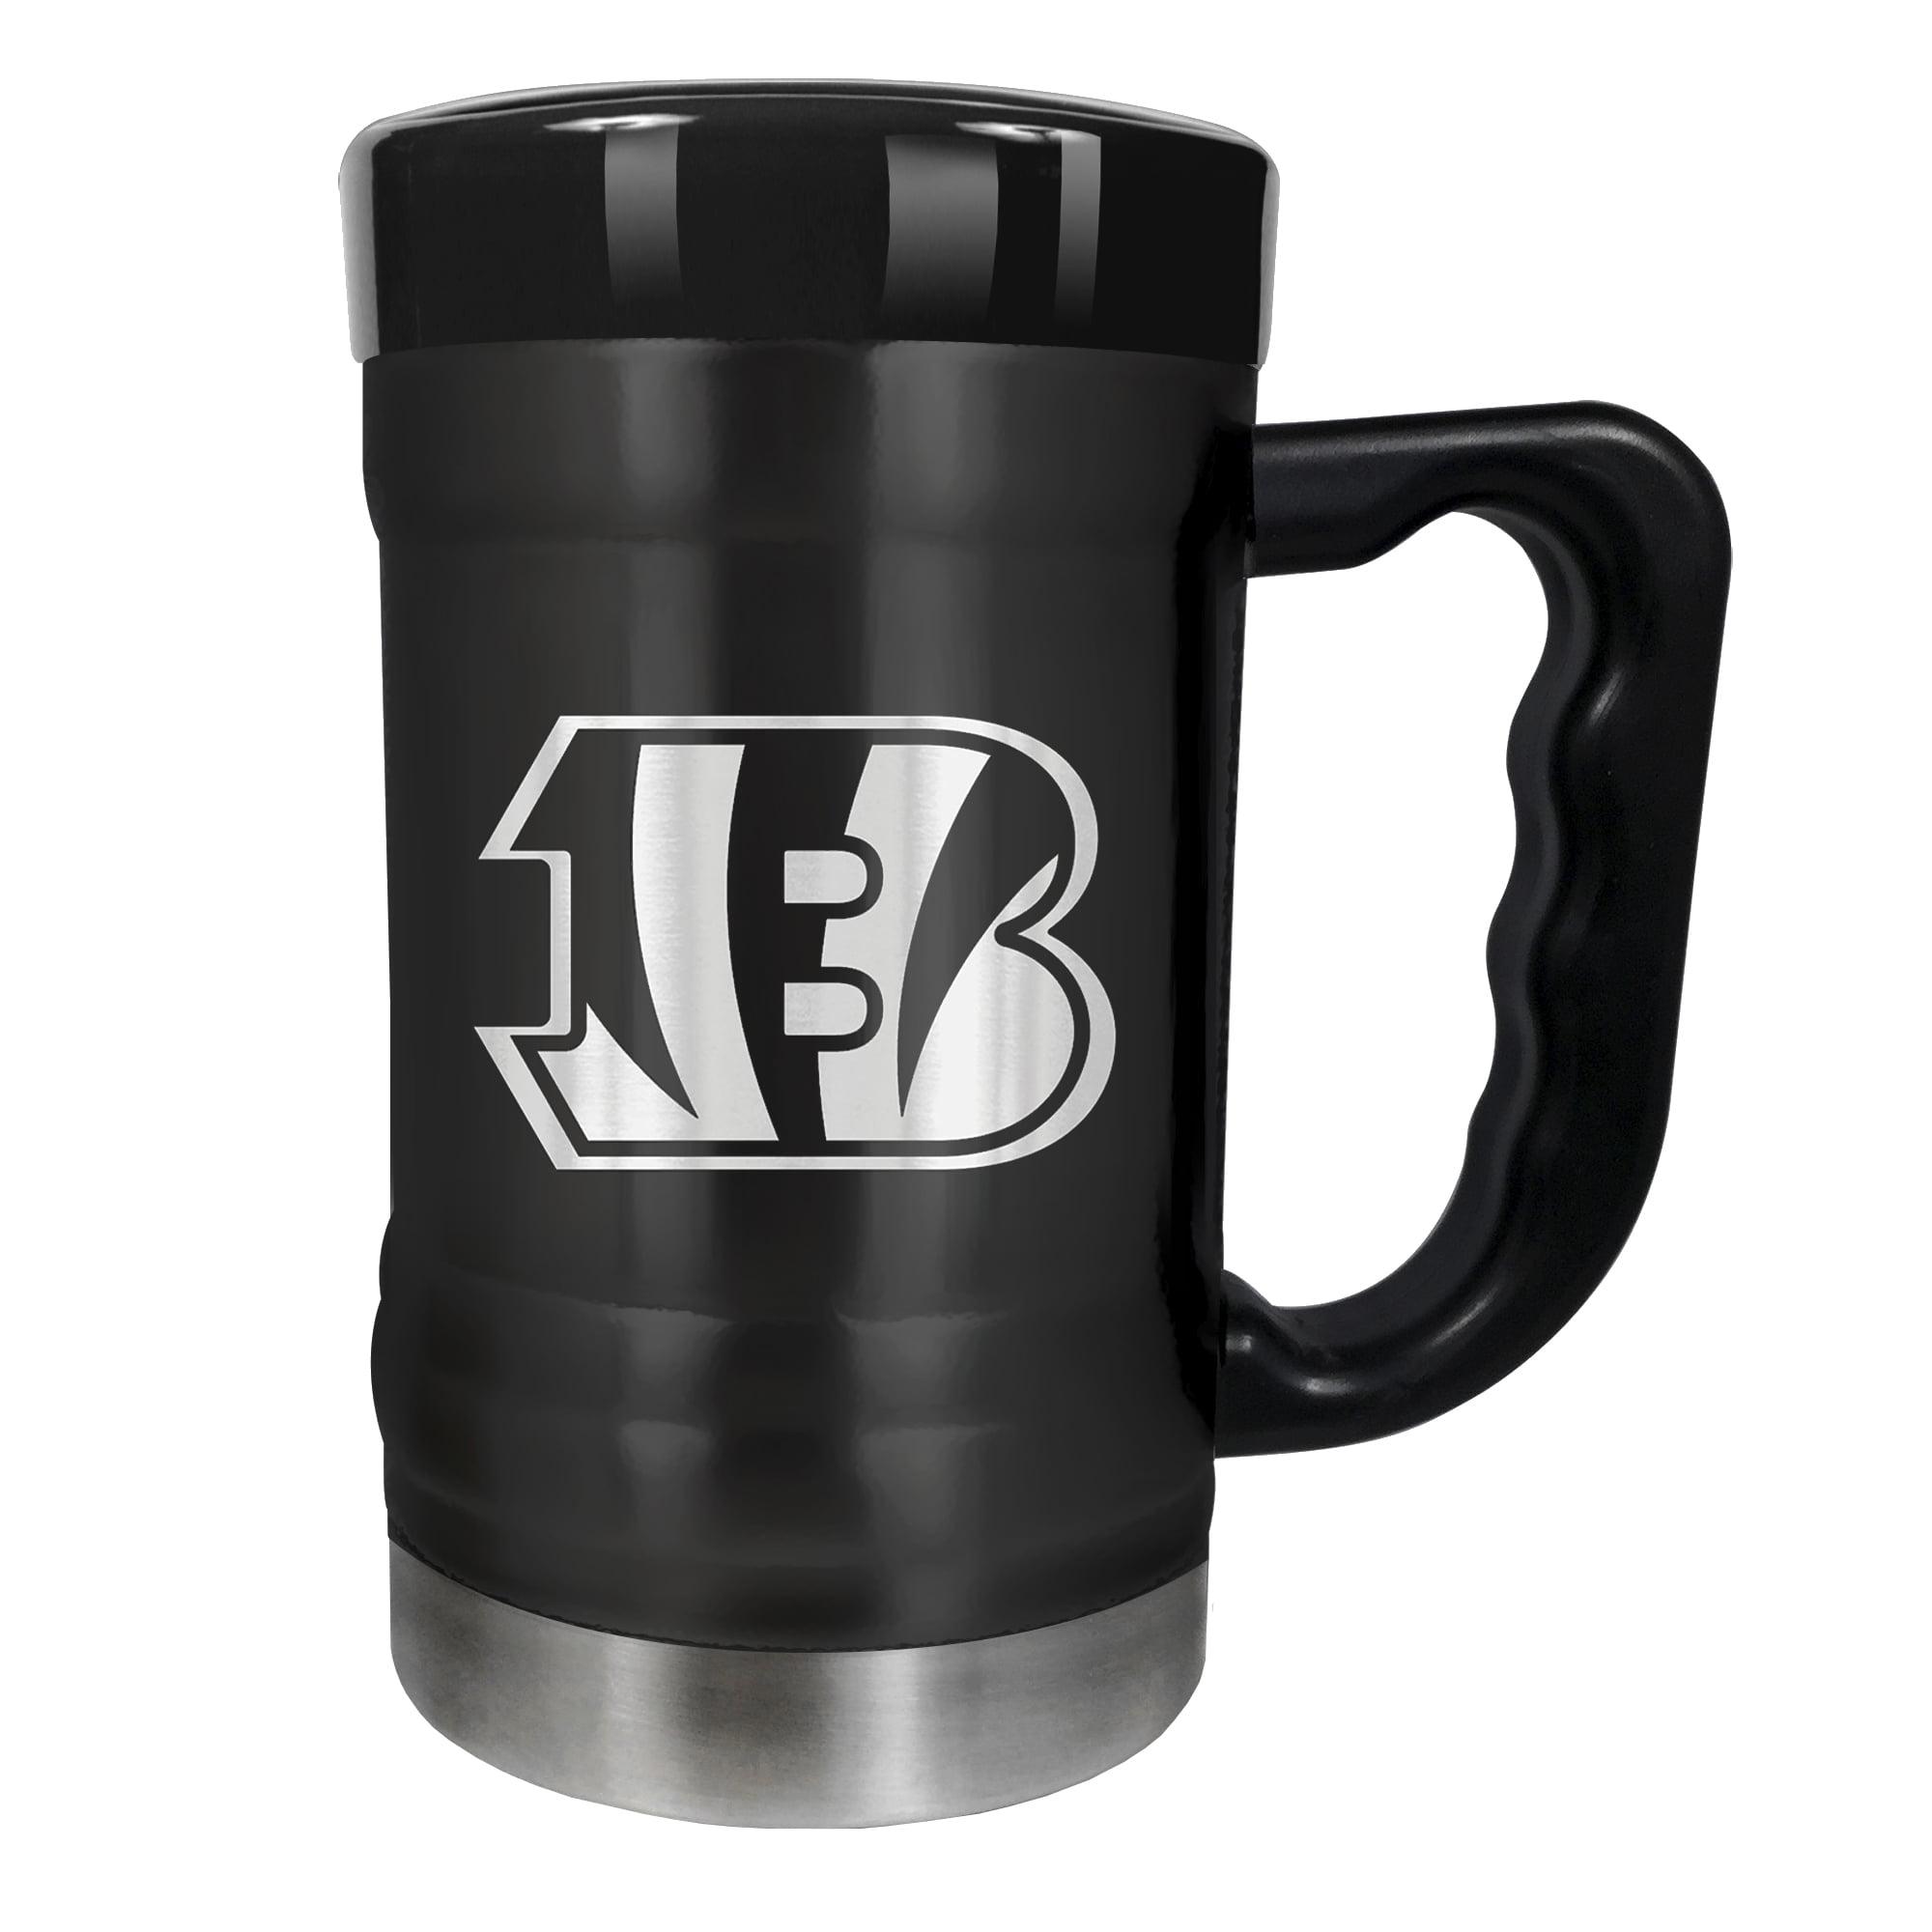 Cincinnati Bengals 15oz. Stealth Coach Coffee Mug - Black - No Size